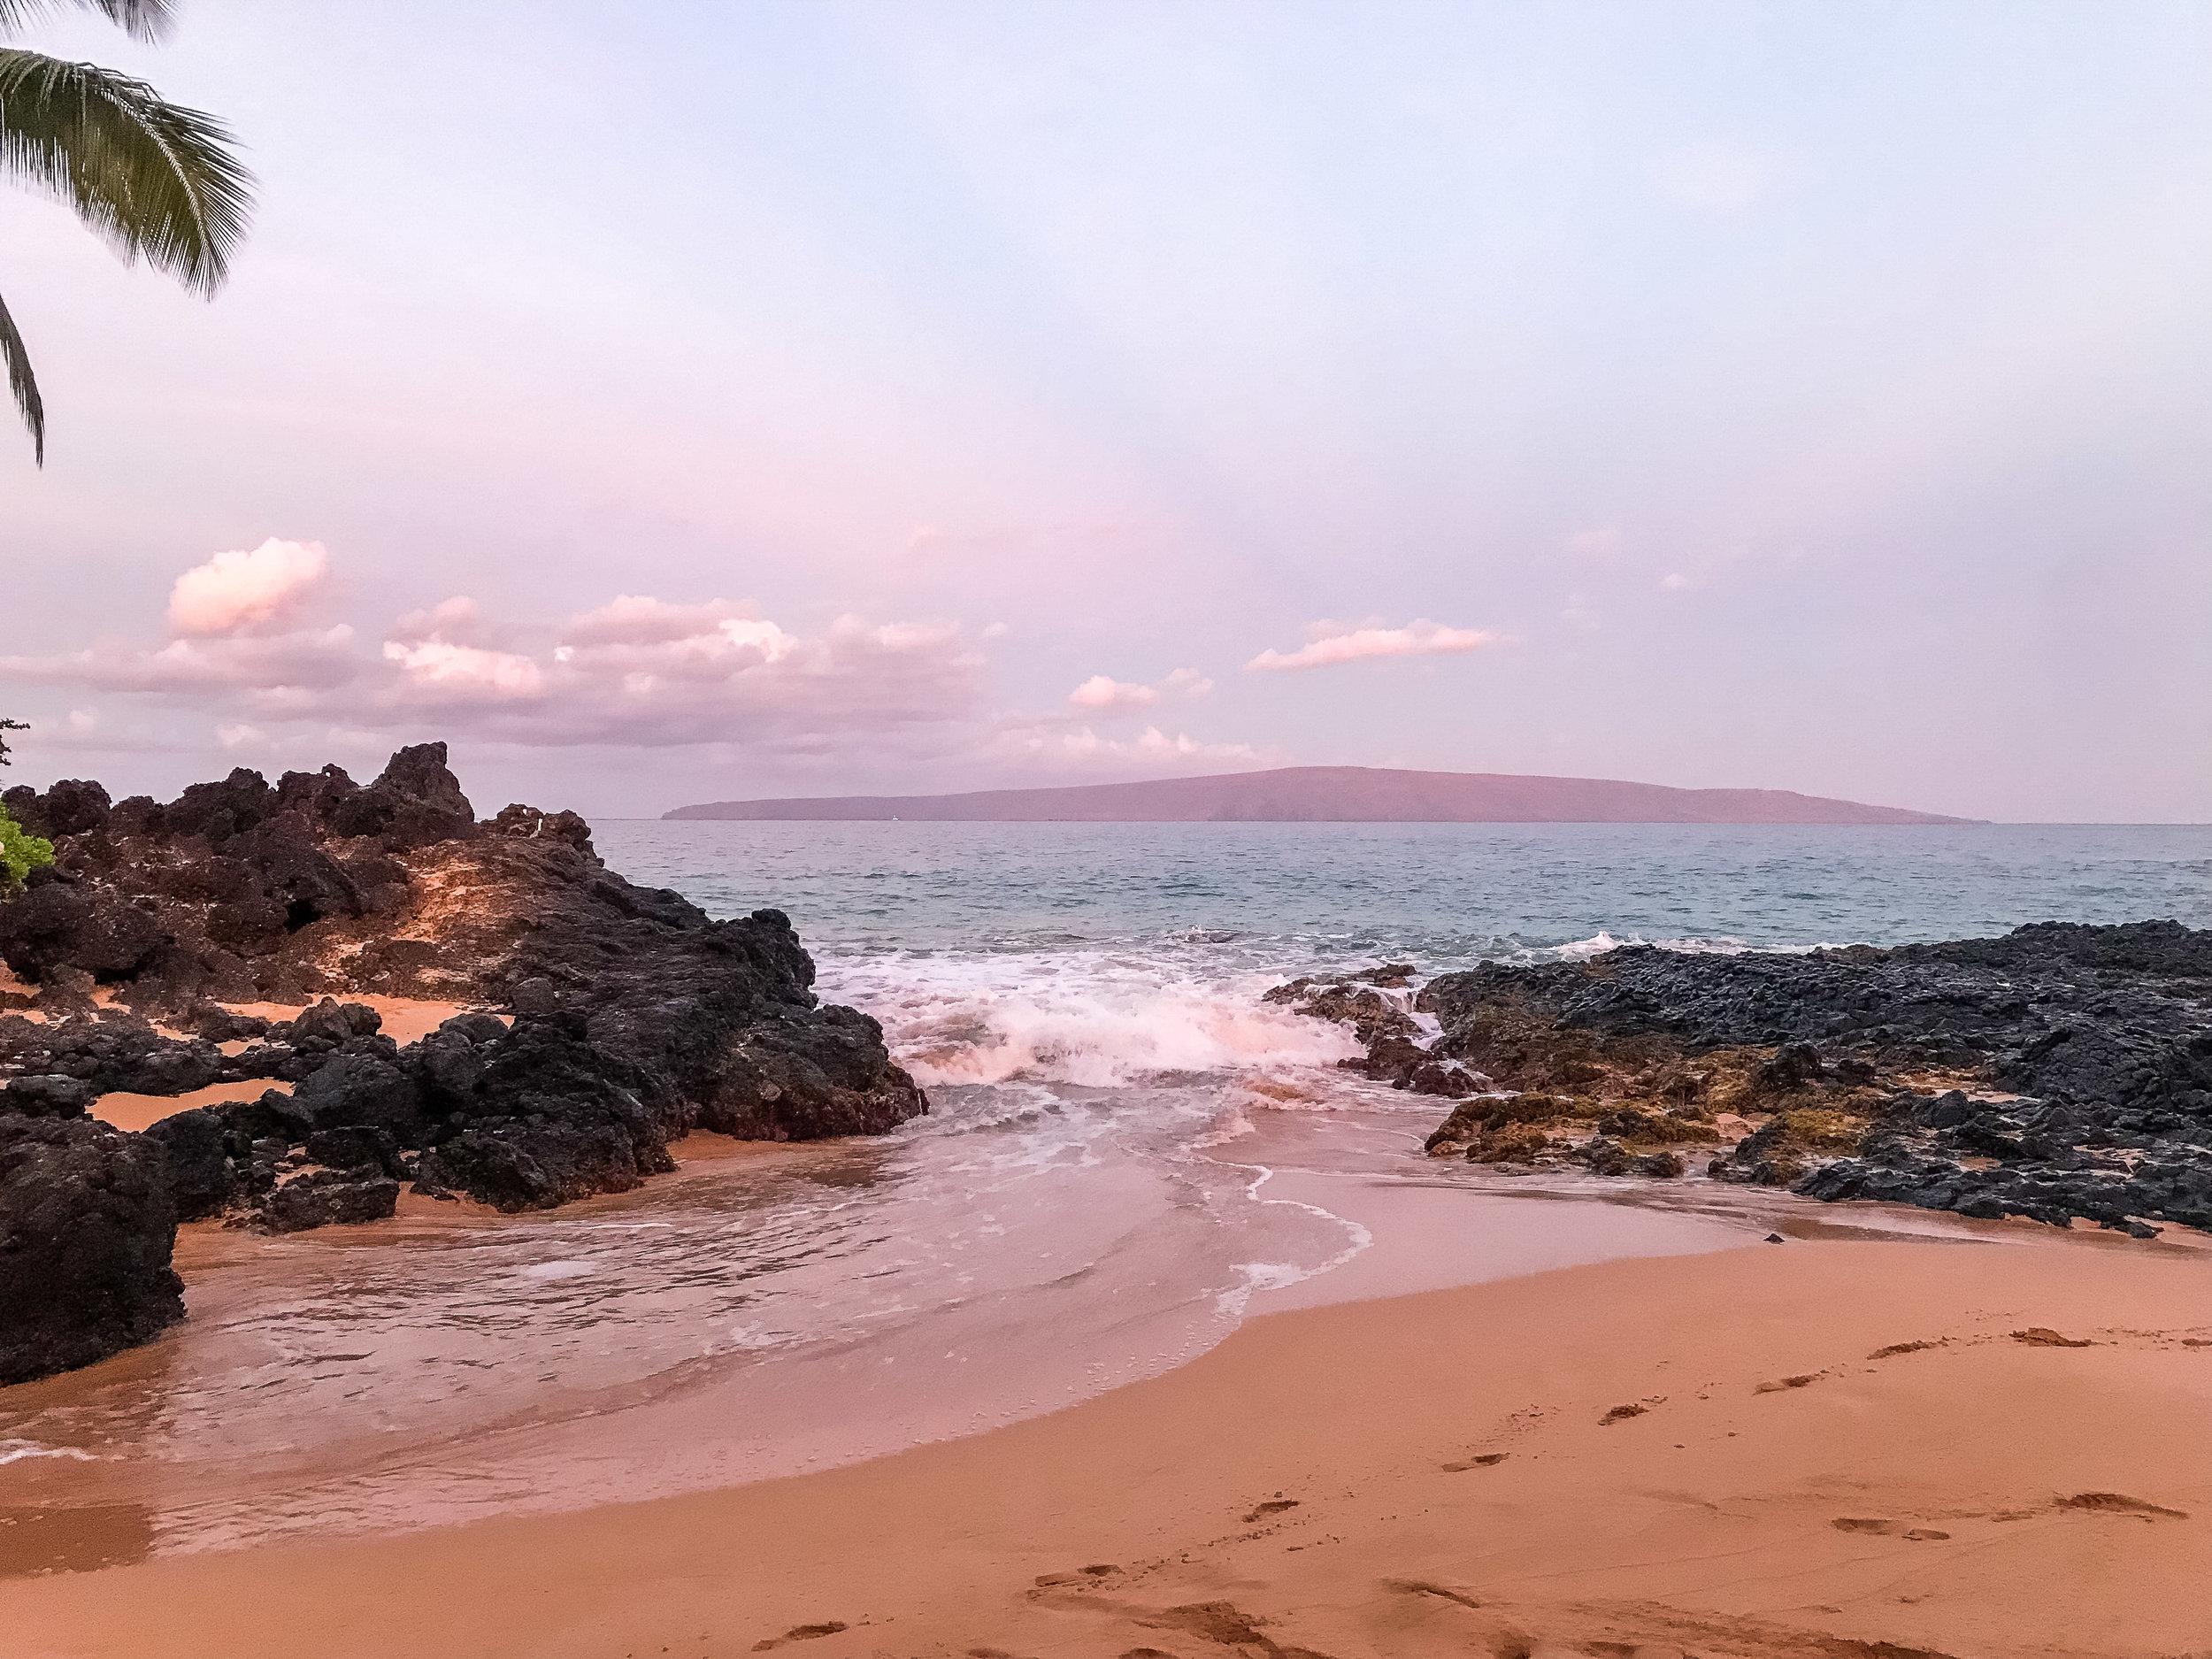 fizz-fade-hawaii-sunrise-stripes2-2.jpg